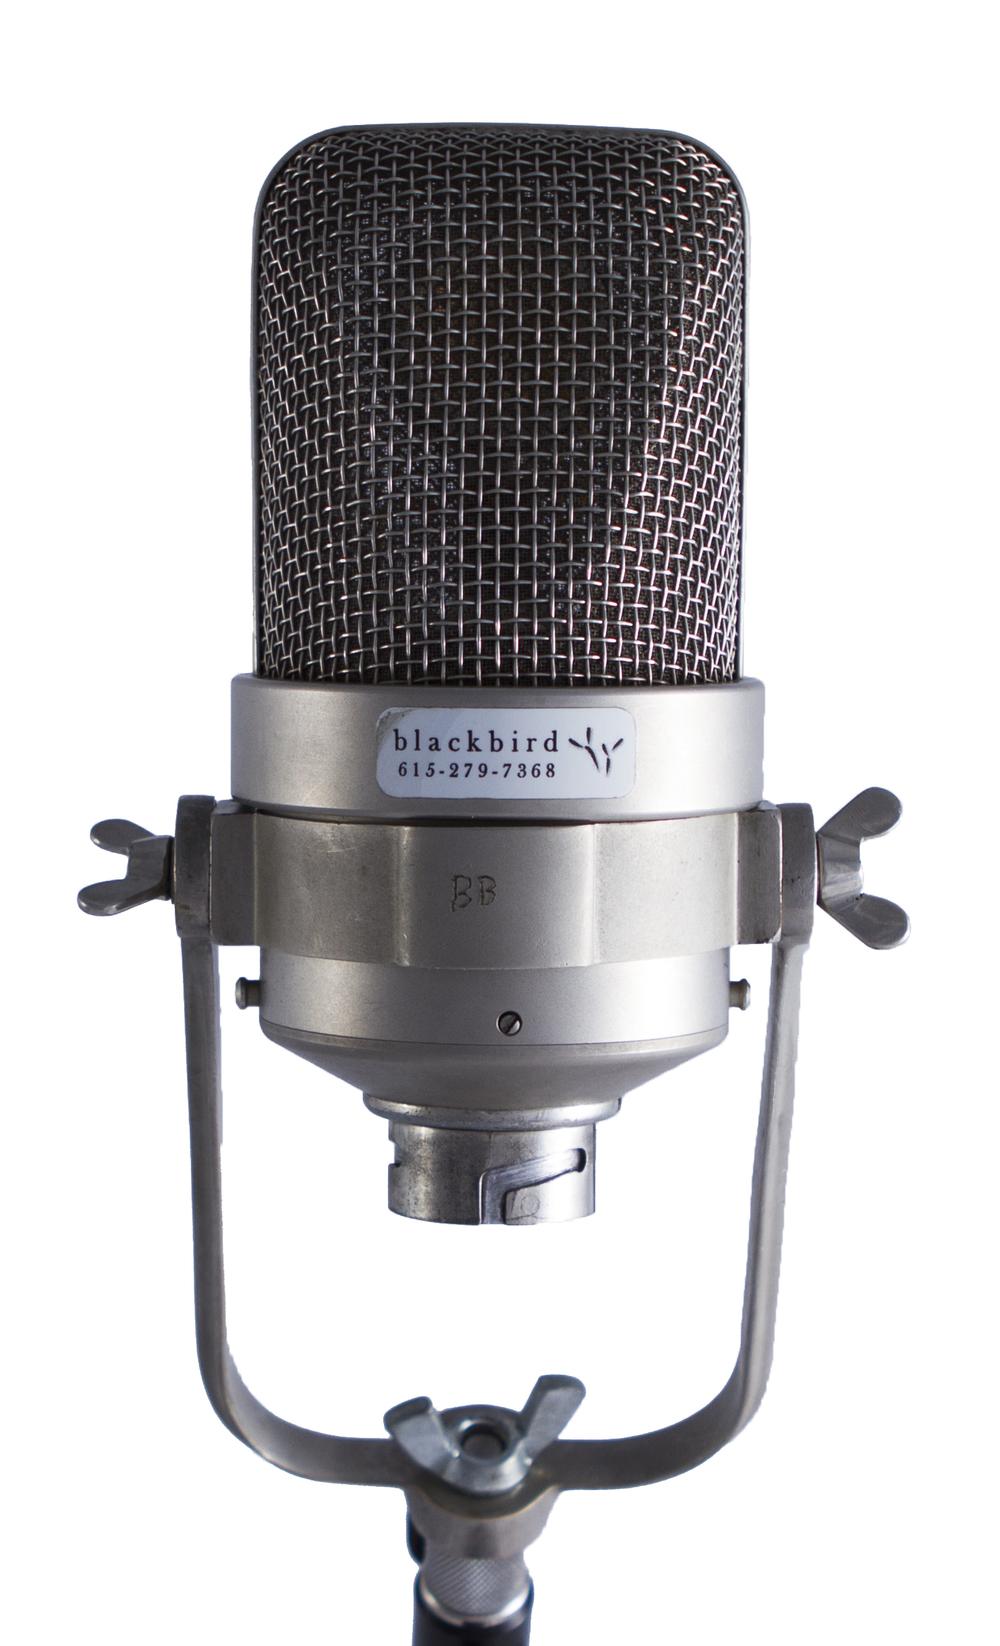 Neumann M-50 - $200 day